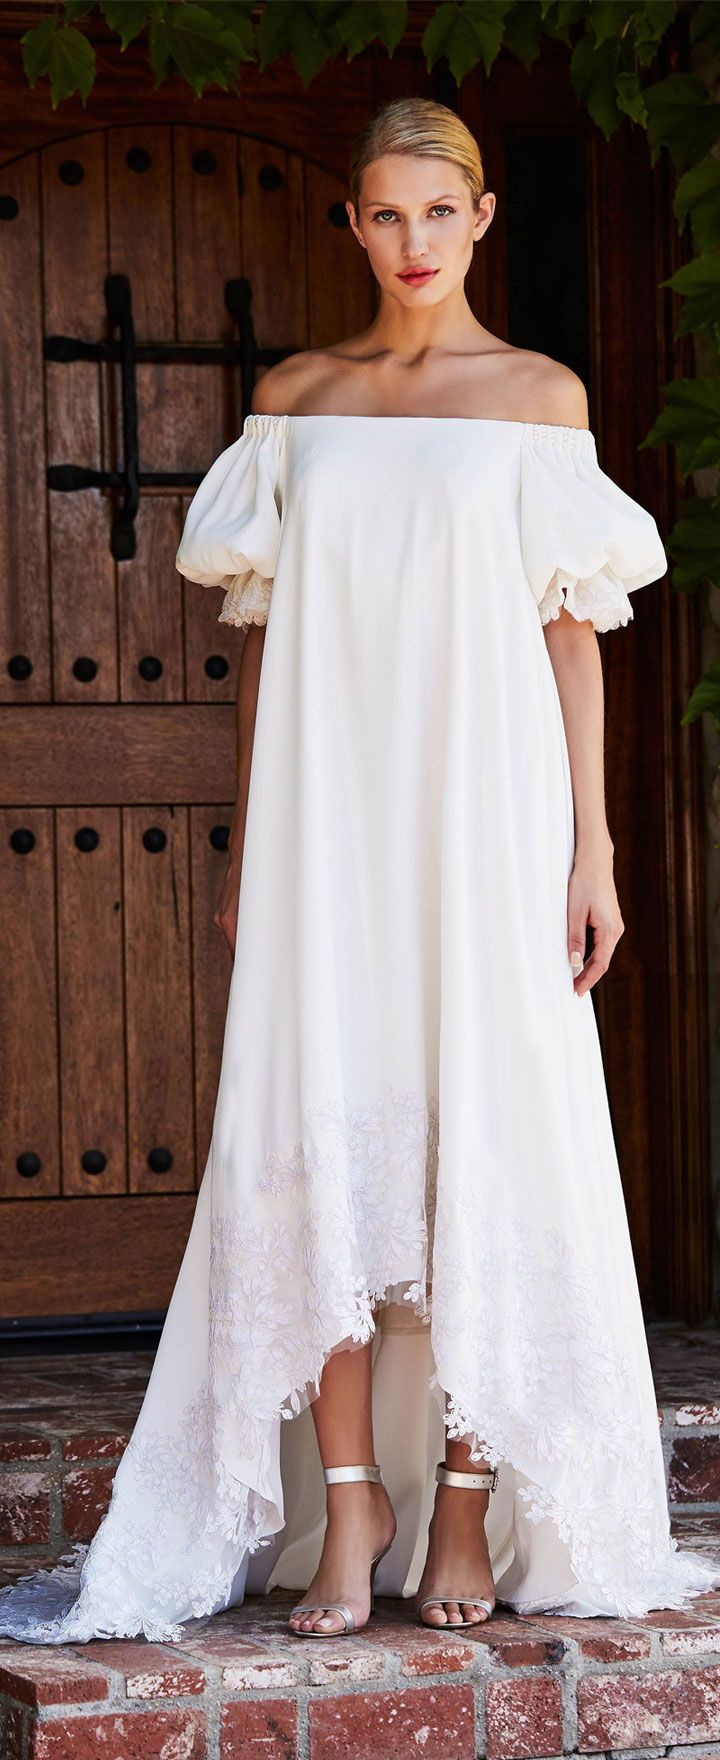 6178cf9c58a Tadashi Shoji Bridal Fall 2018 Wedding Dress Collection - I Take You ...